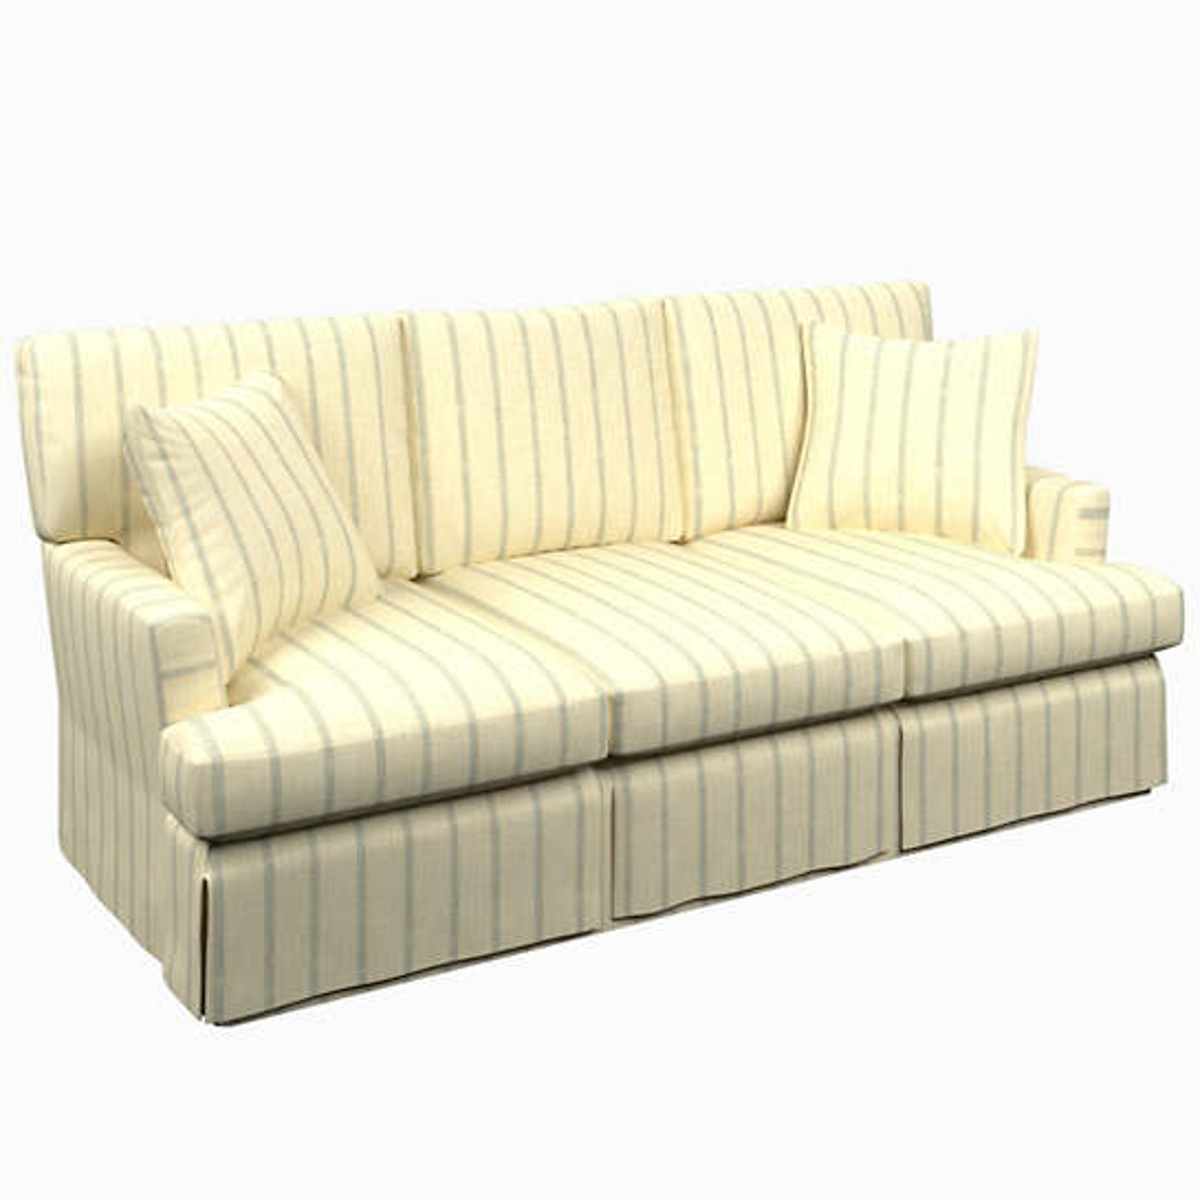 Glendale Stripe Light Blue/Natural Saybrook 3 Seater Sofa